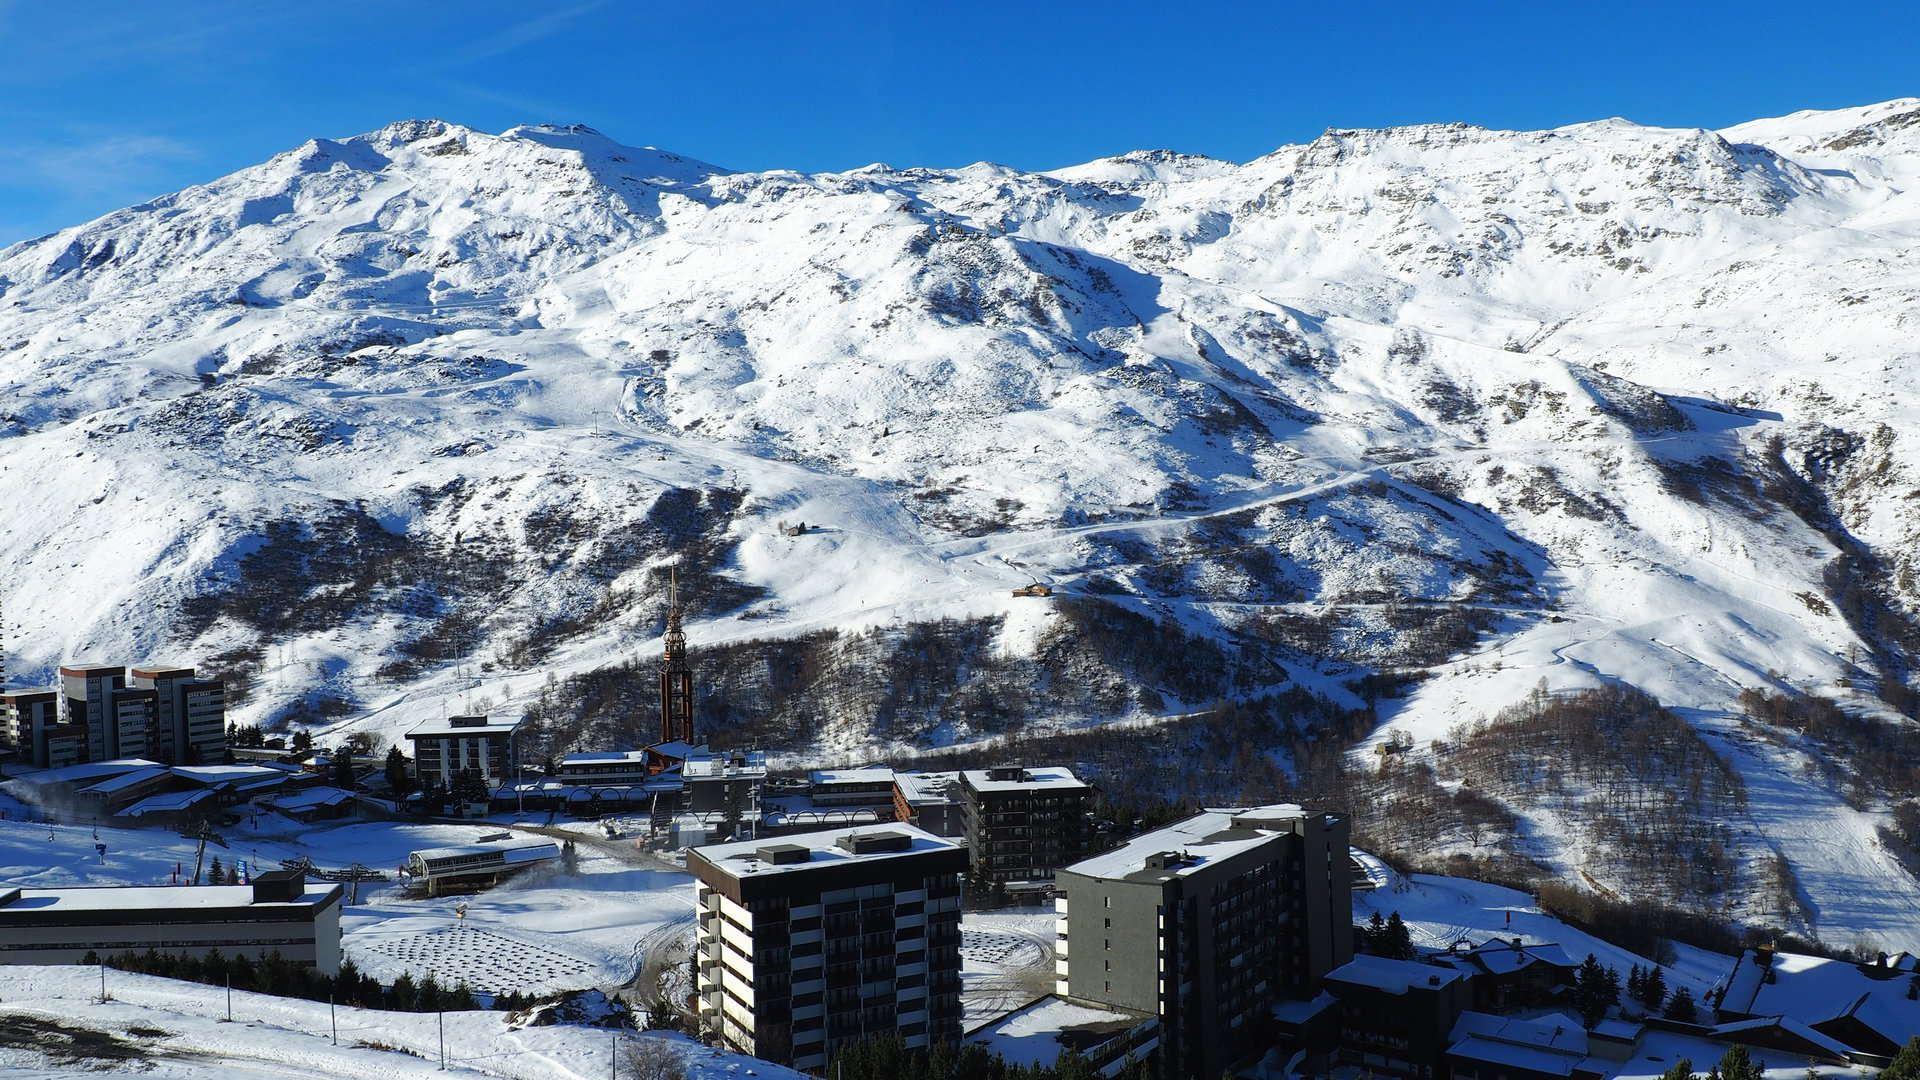 2 Pièces 6 Pers skis au pieds / Evons 601